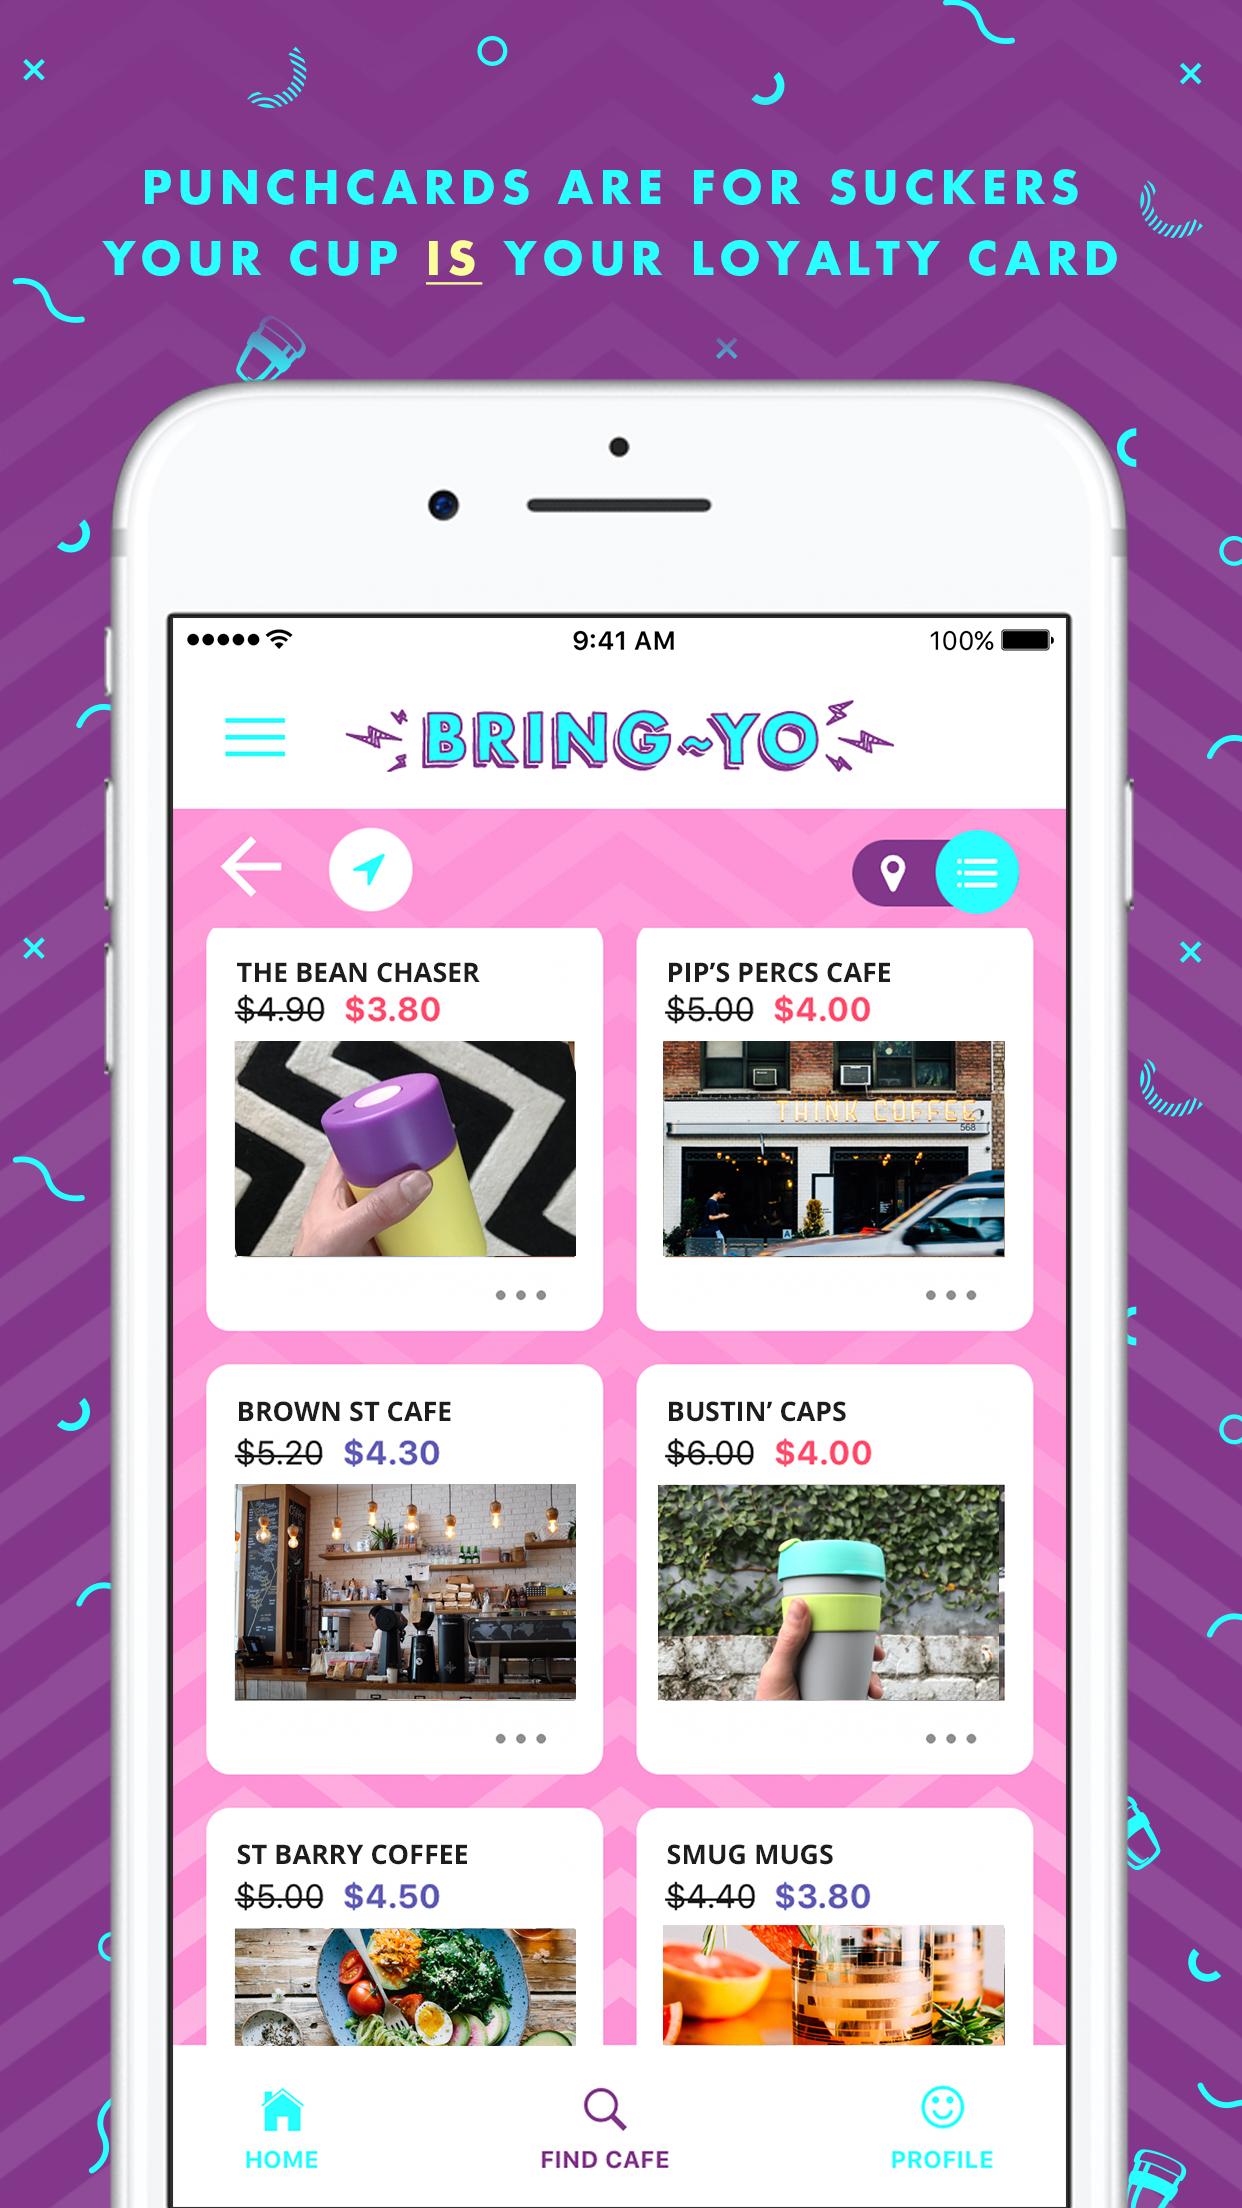 Bringyo screenshot 3.jpg